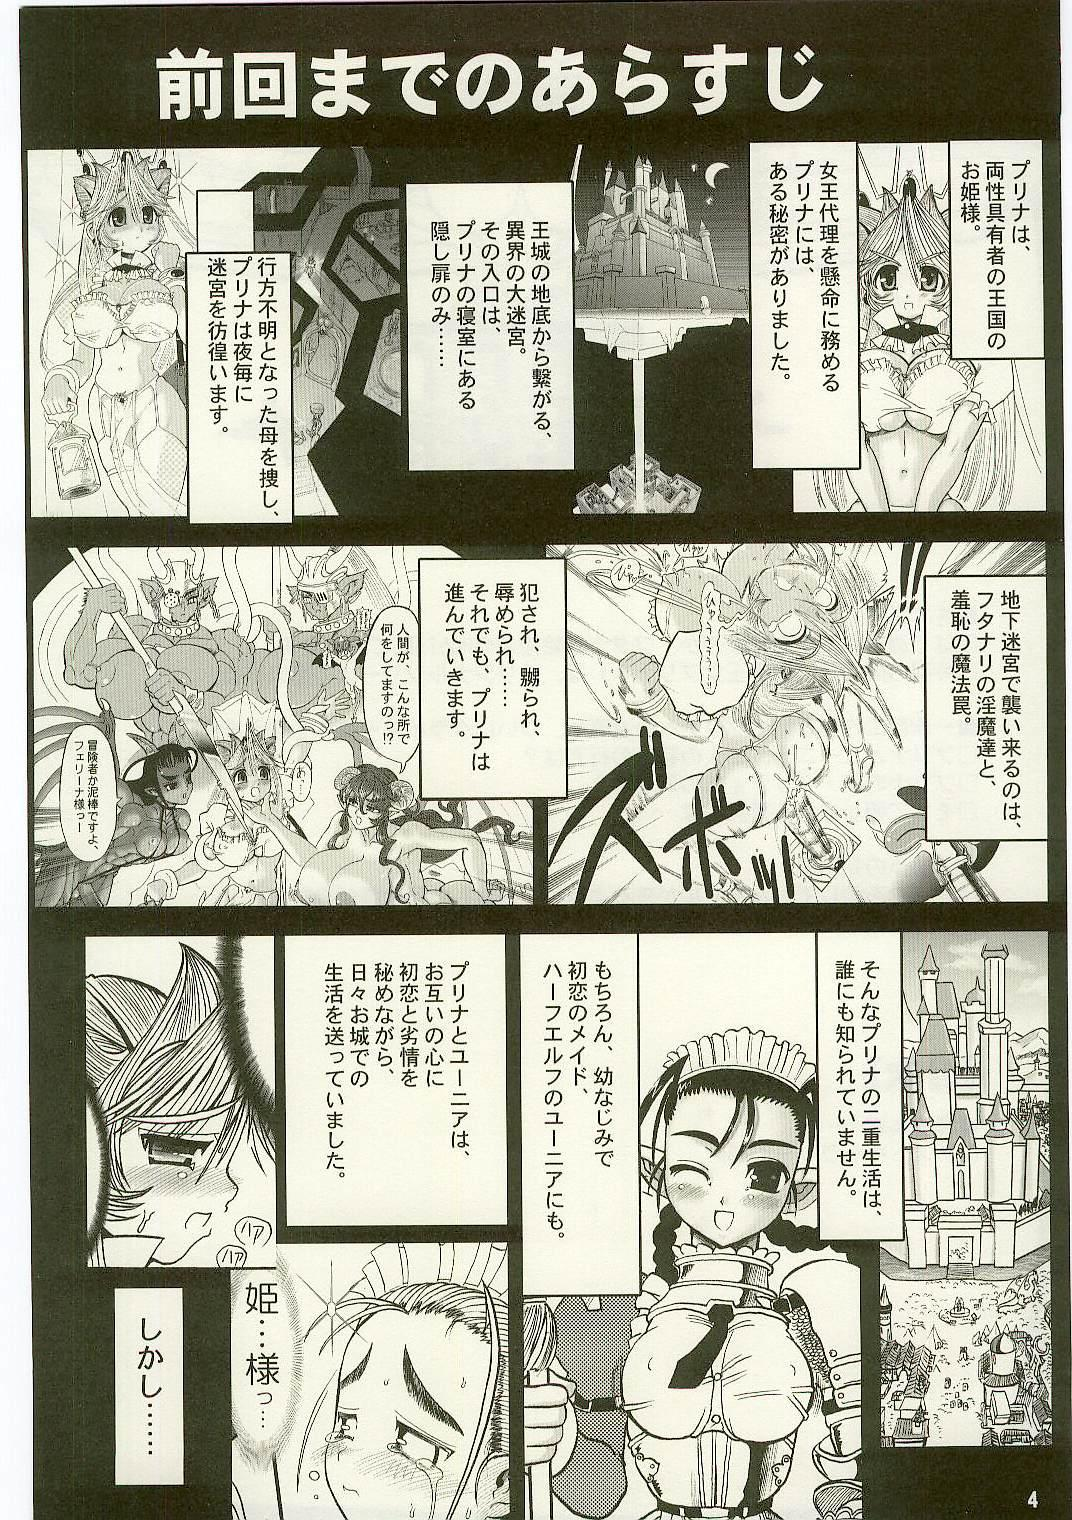 TGWOA Vol.17 - Meikyuu Oujo Prina 3 1